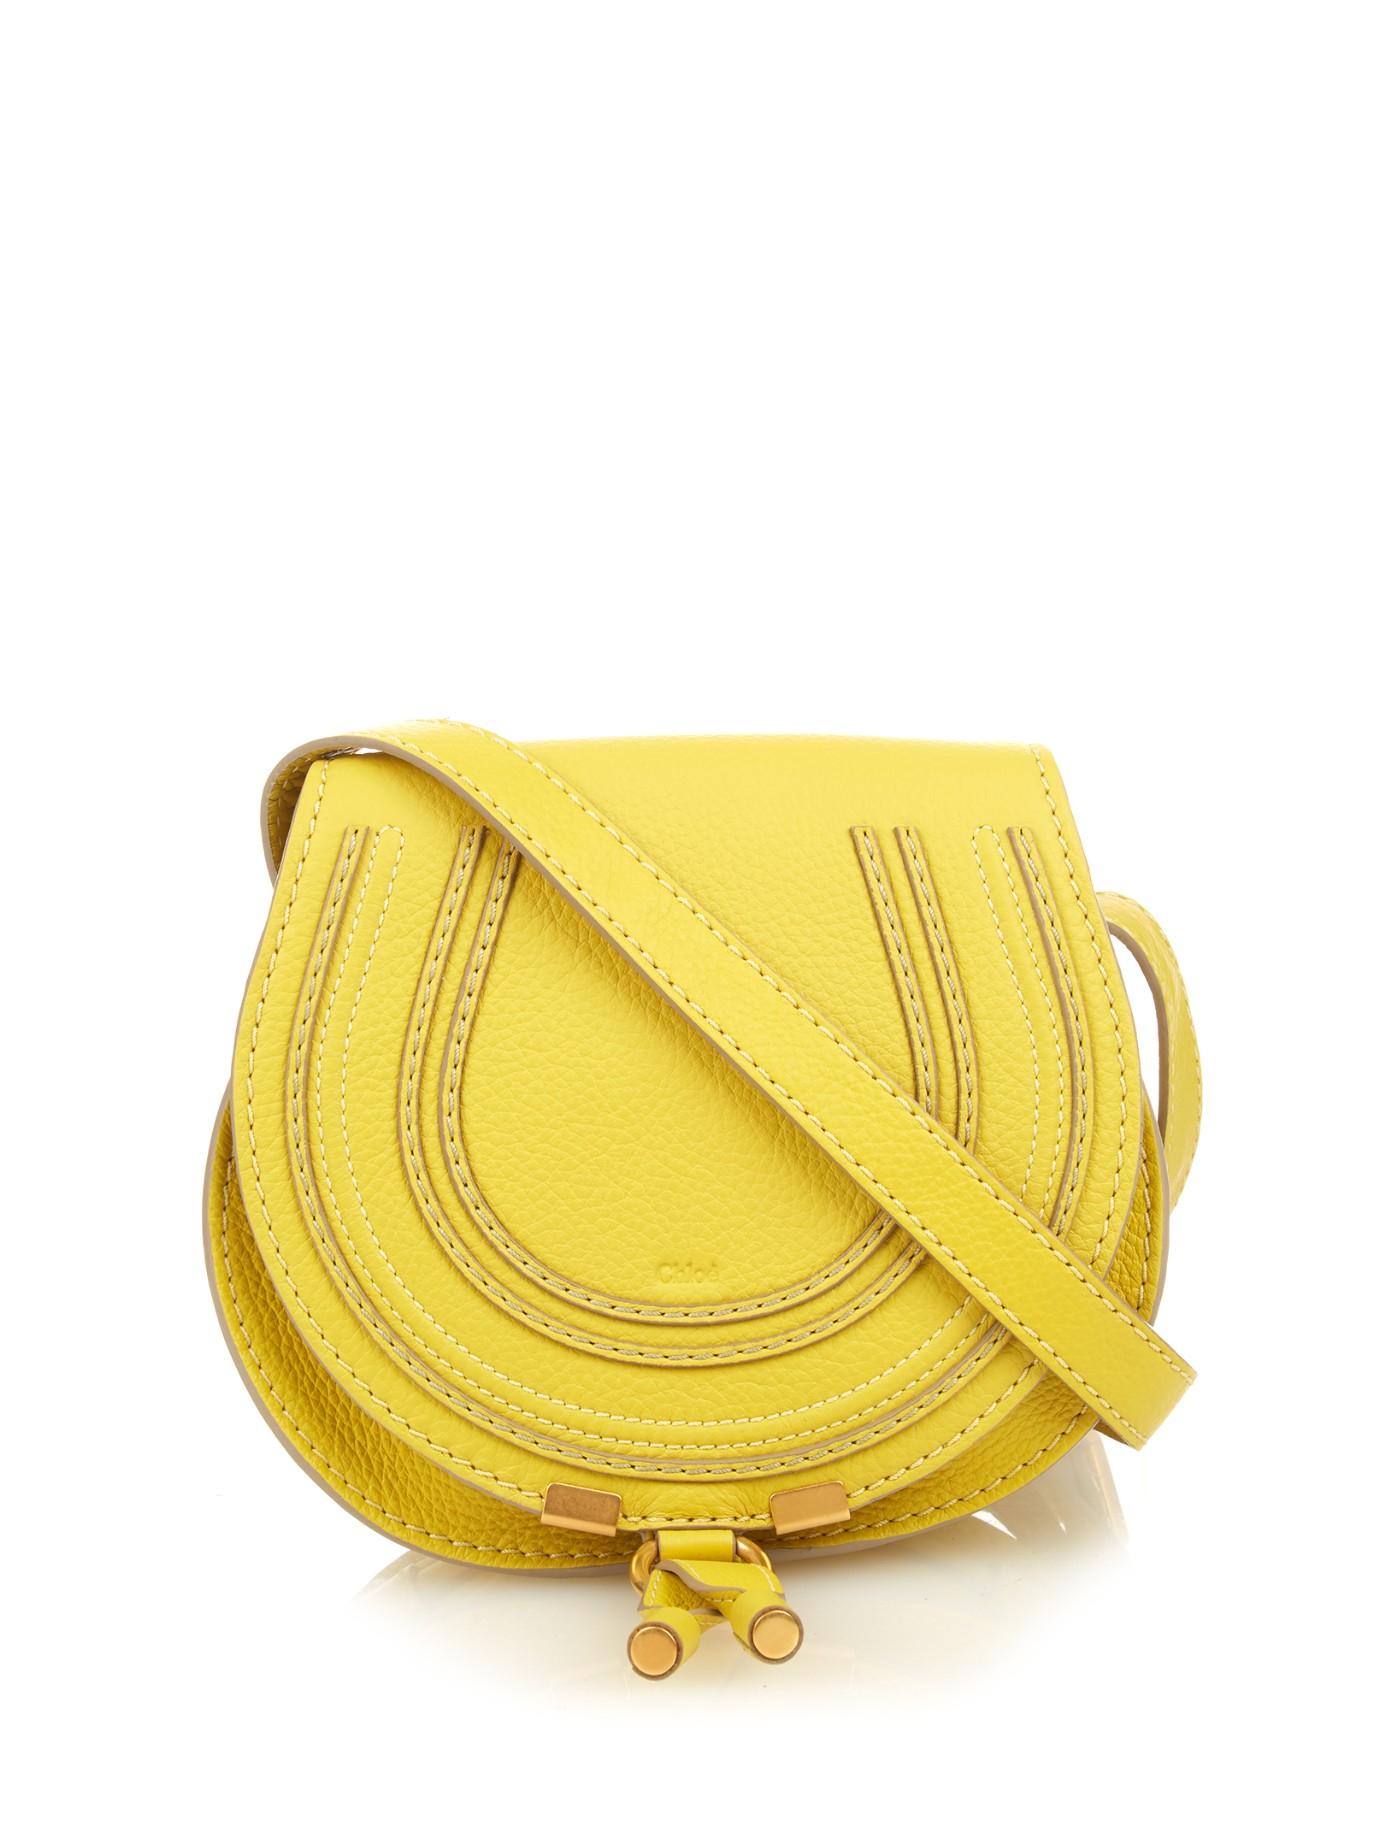 f947921e56 Chloé Marcie Mini Leather Cross-body Bag in Yellow - Lyst